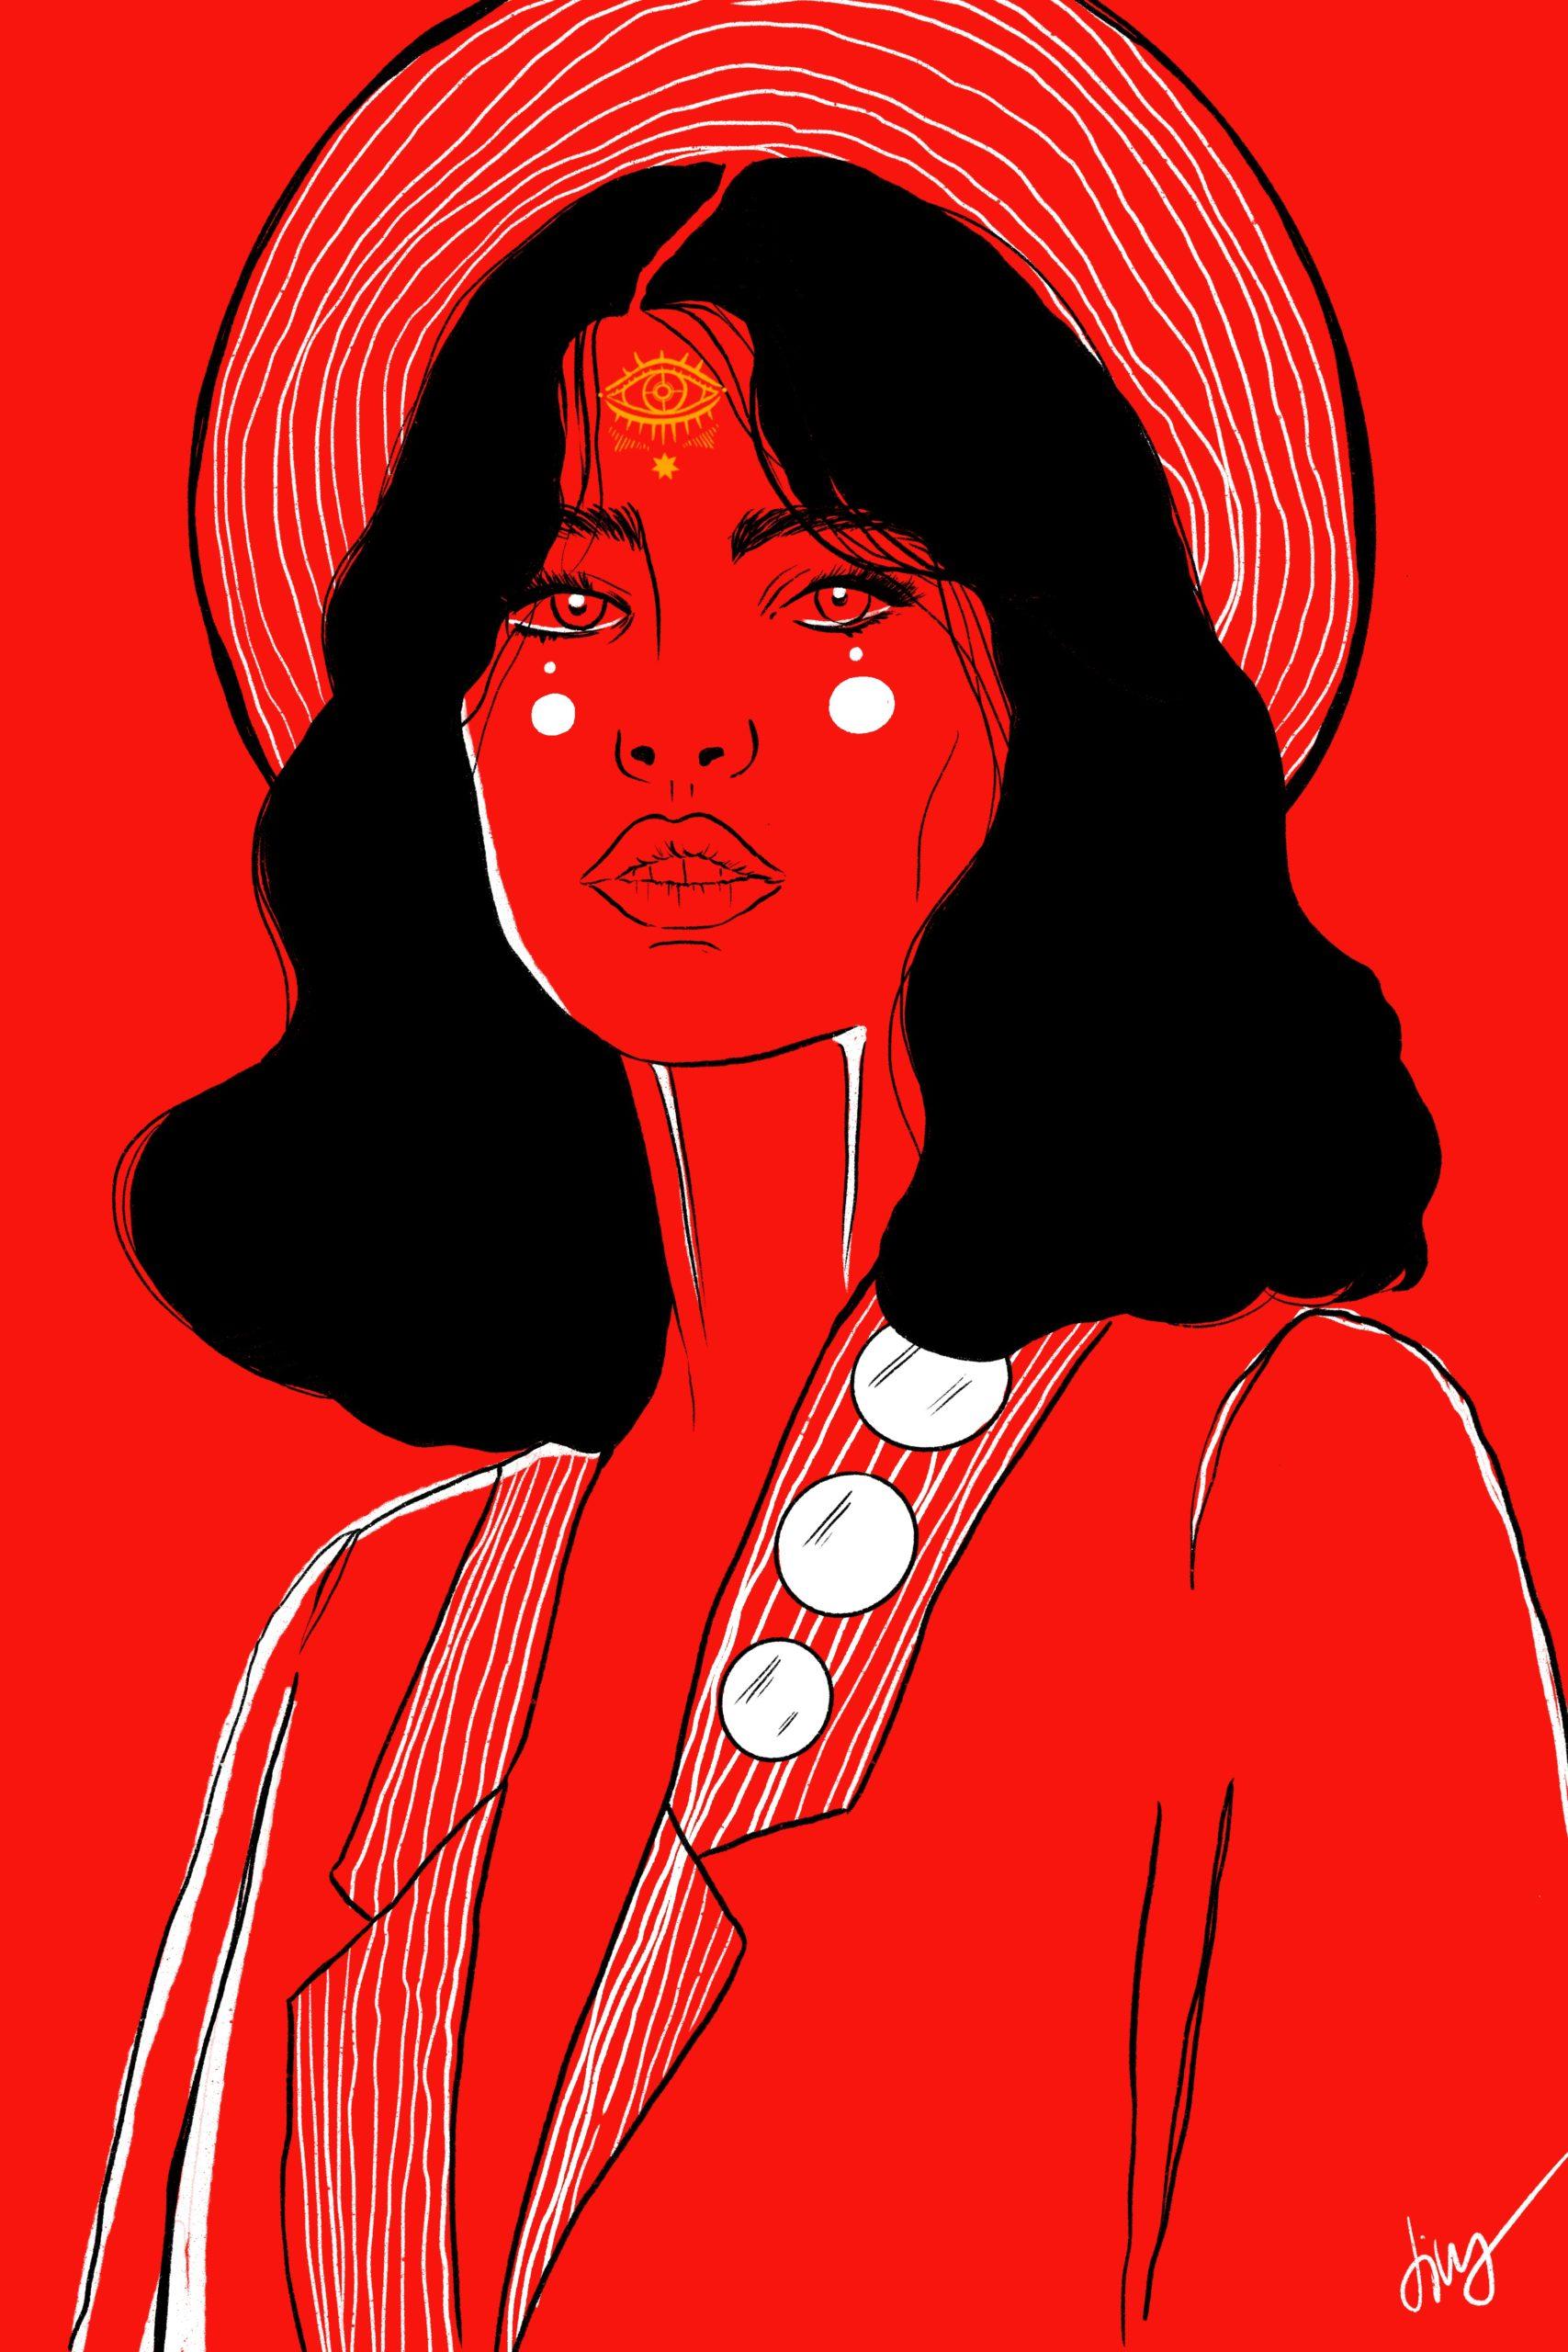 Illustration Ink Procreate Schwarz Rot 3. Auge Frau Woman White Hut Hat